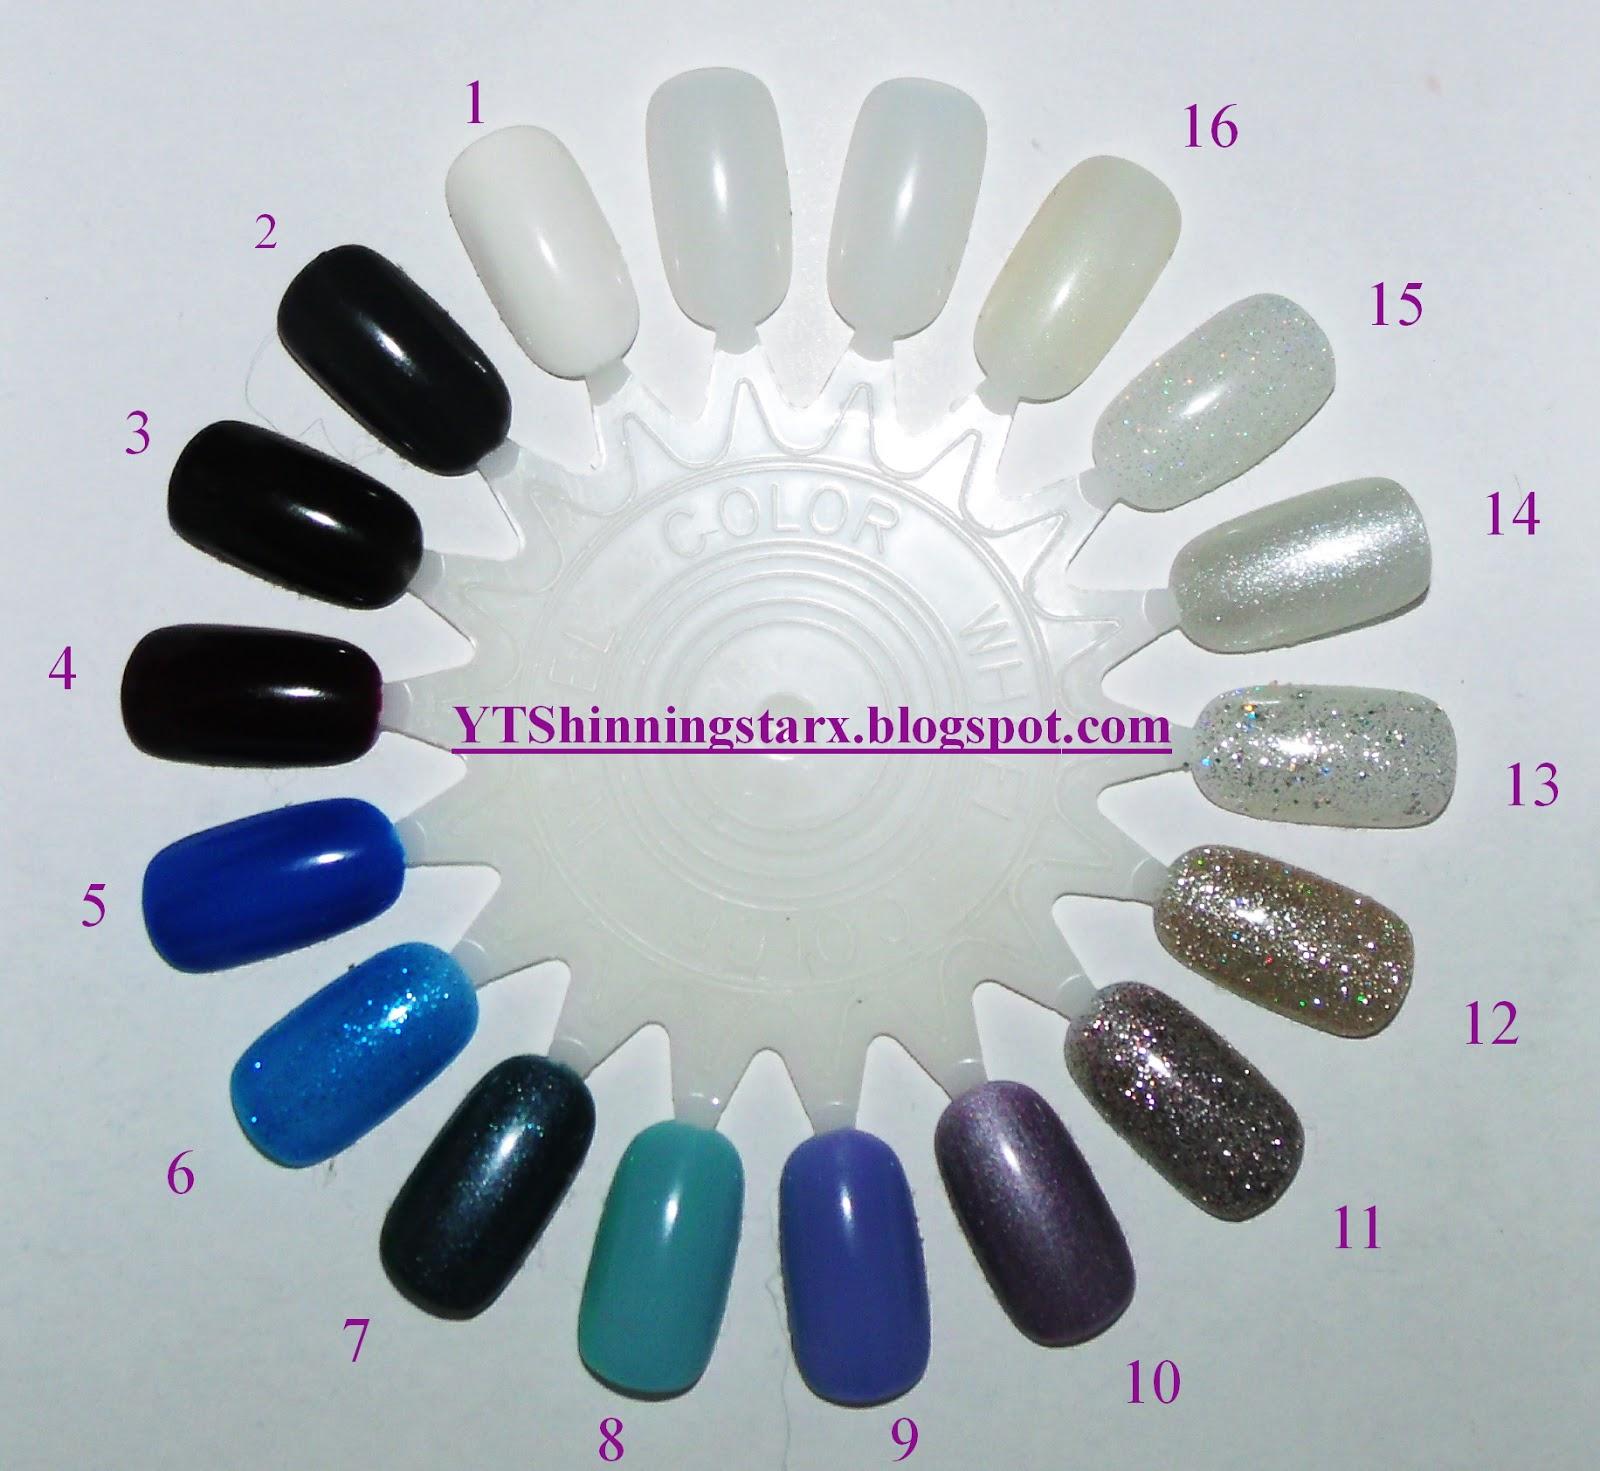 YTShinningstarx: Gel nail polish collection/ Nail wheel swatches